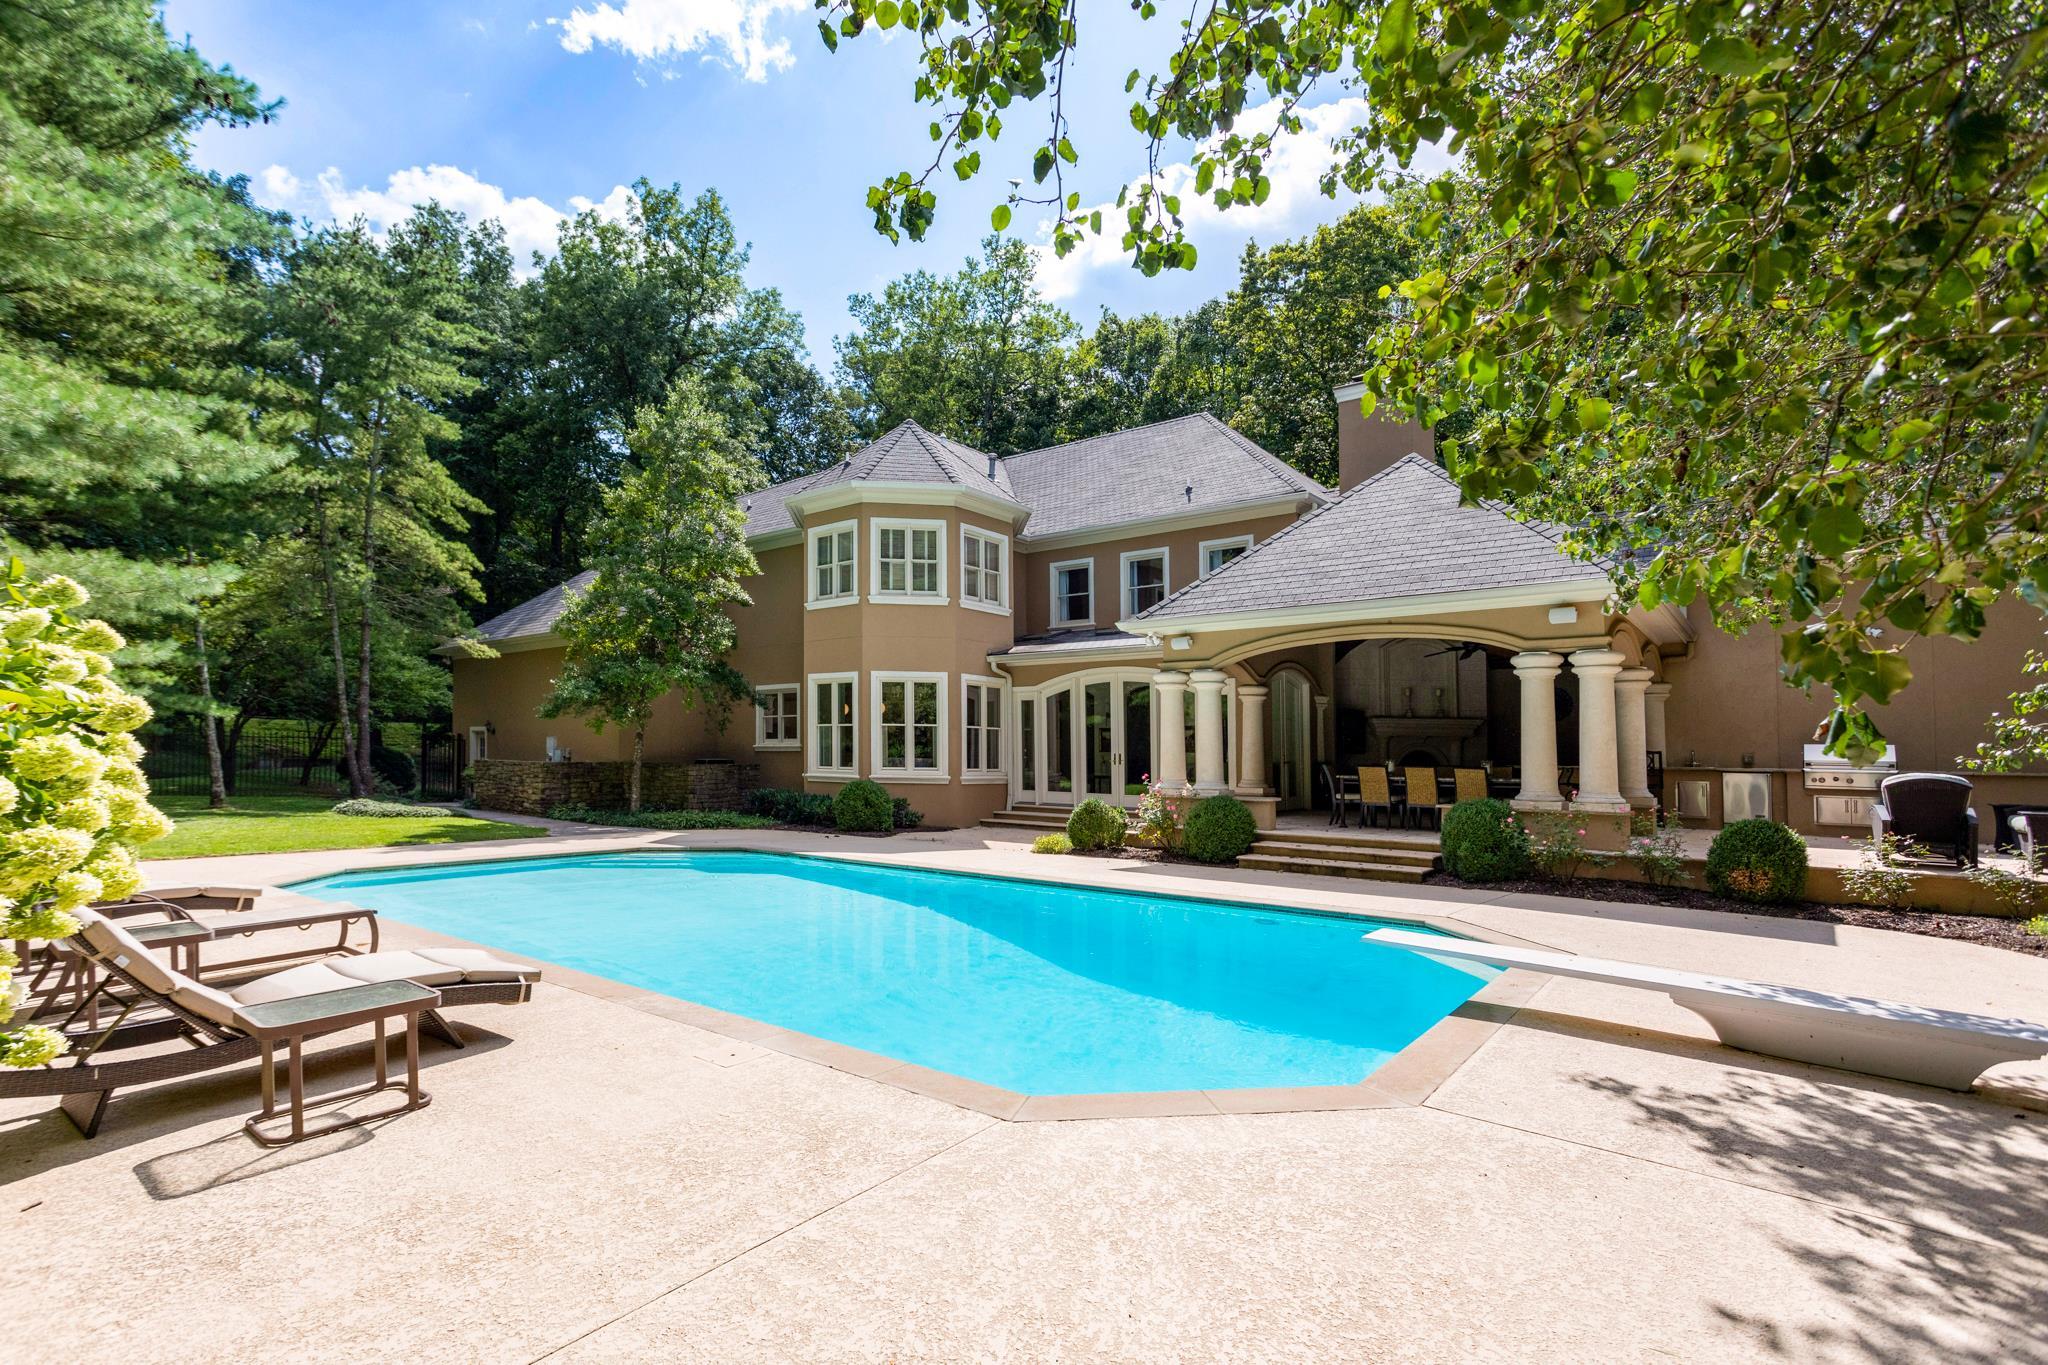 4918 Tyne Valley Blvd, Nashville, TN 37220 - Nashville, TN real estate listing